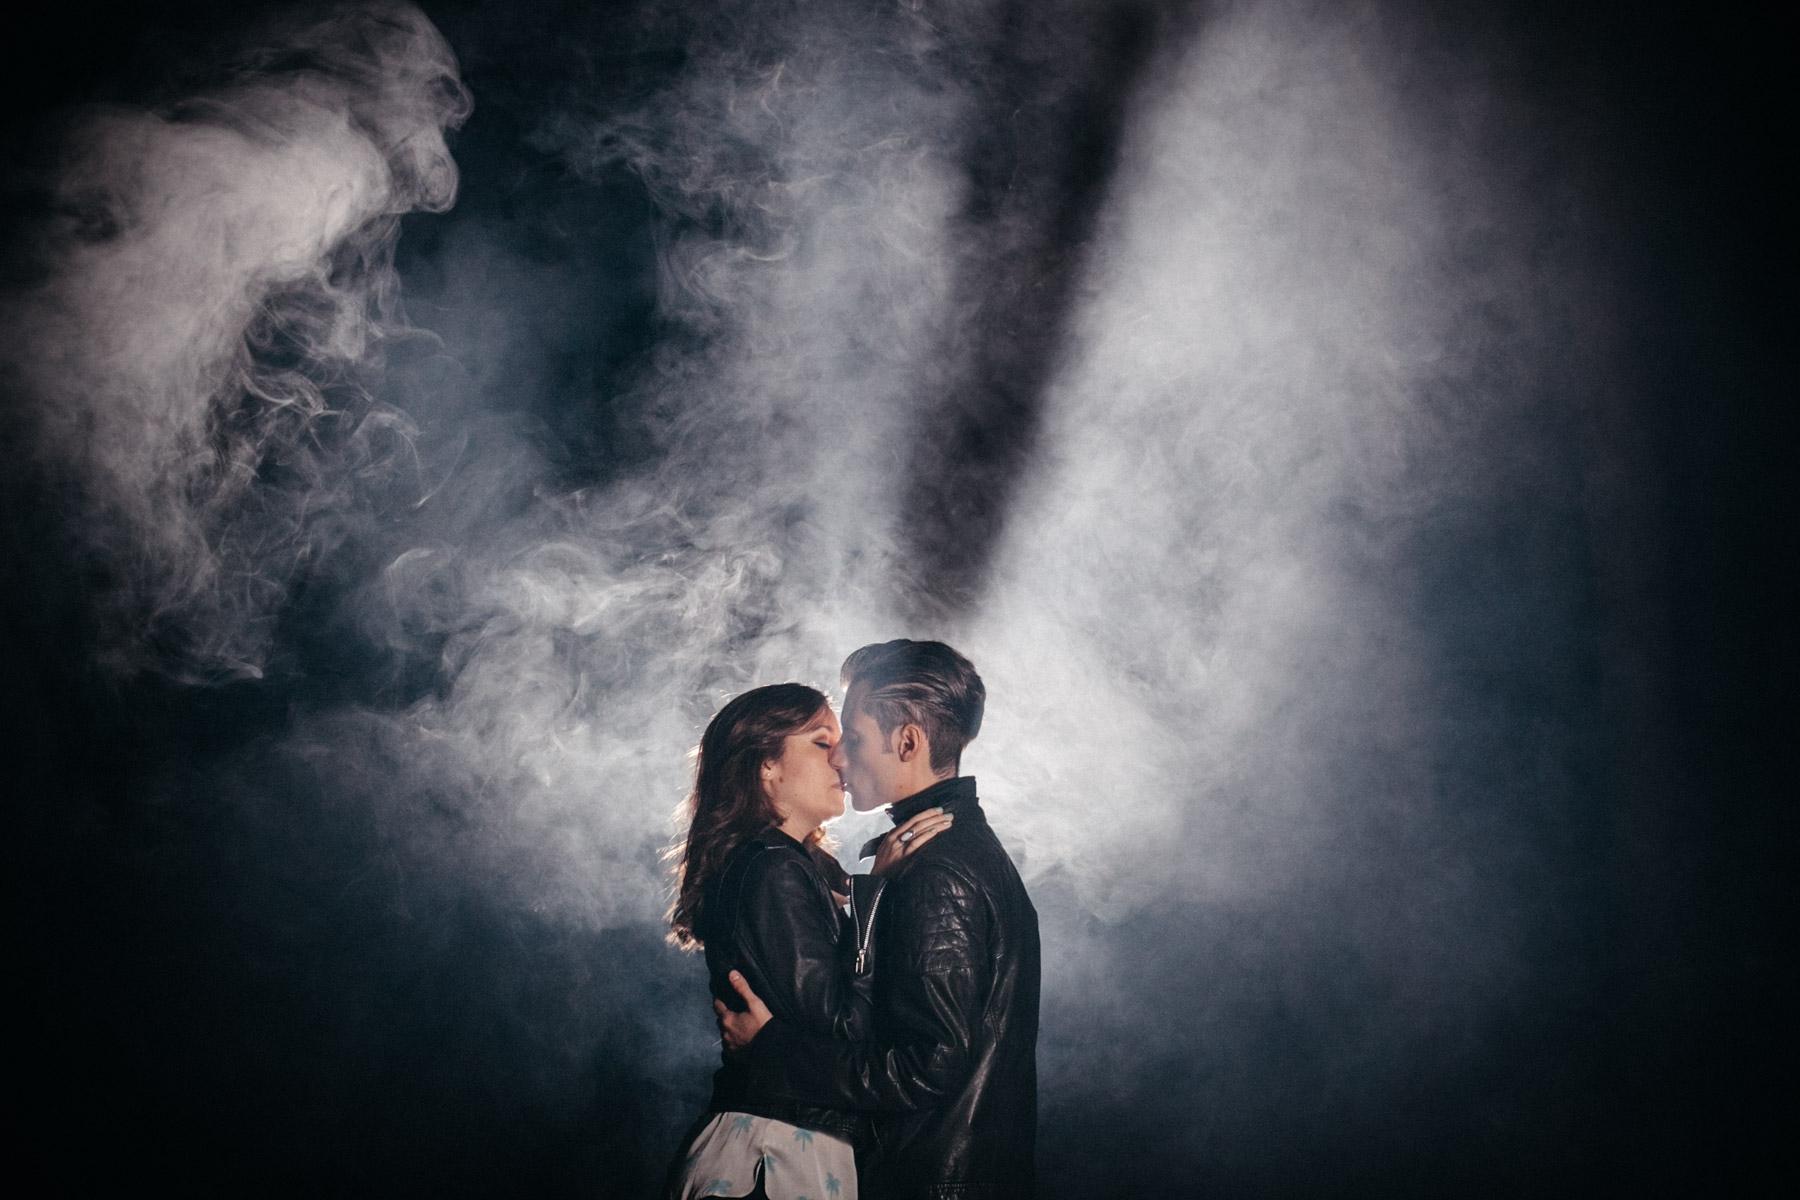 fotografo de bodas Jairo Crena-15